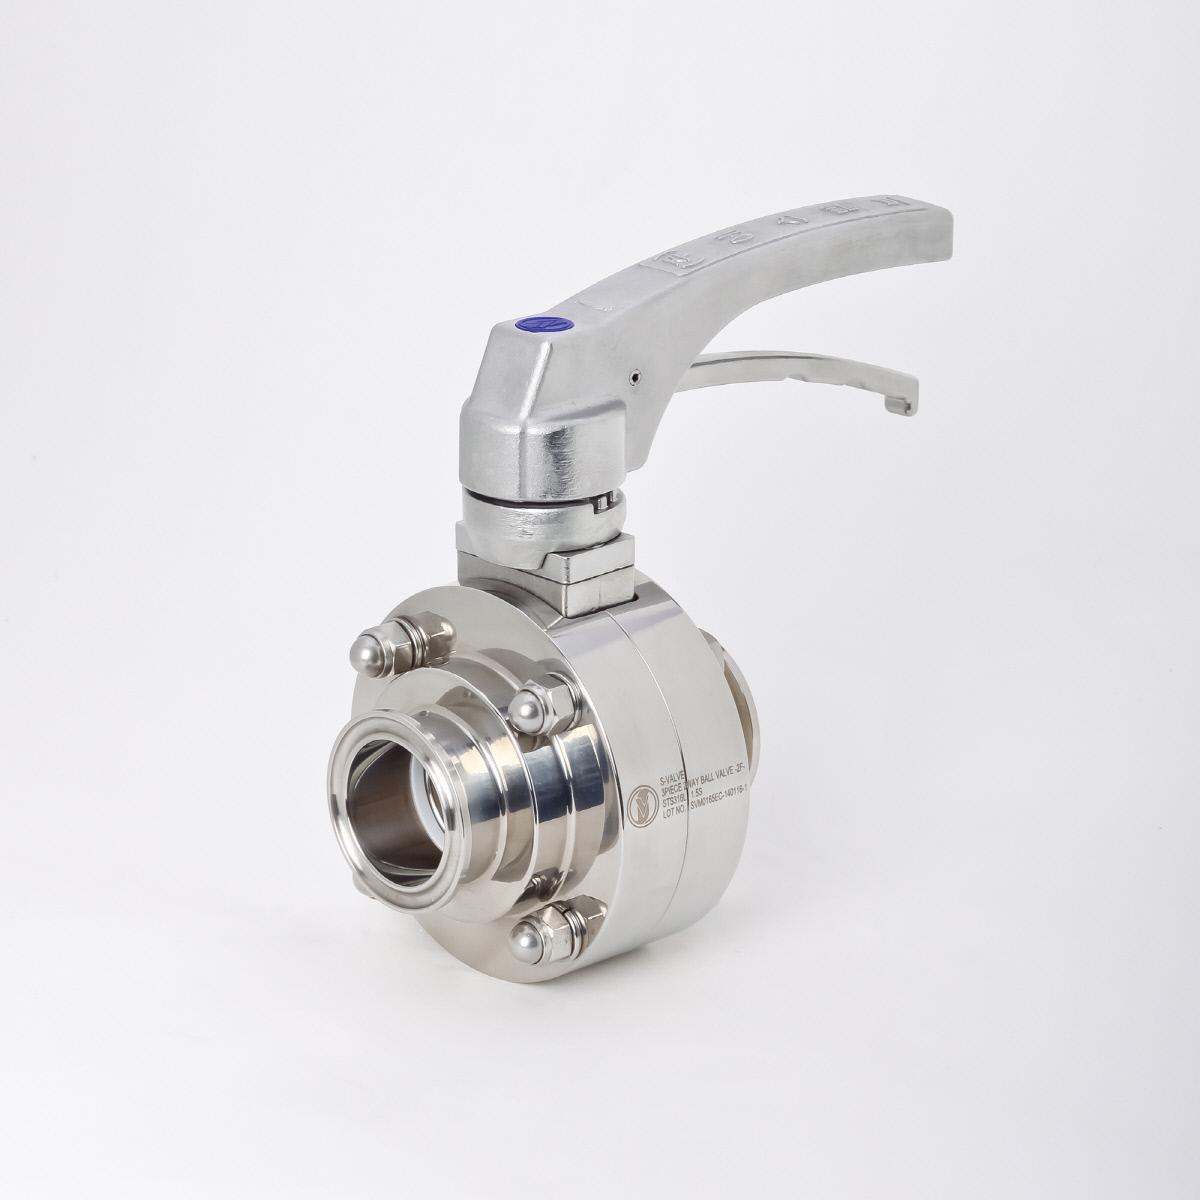 S-valve_0069.jpg